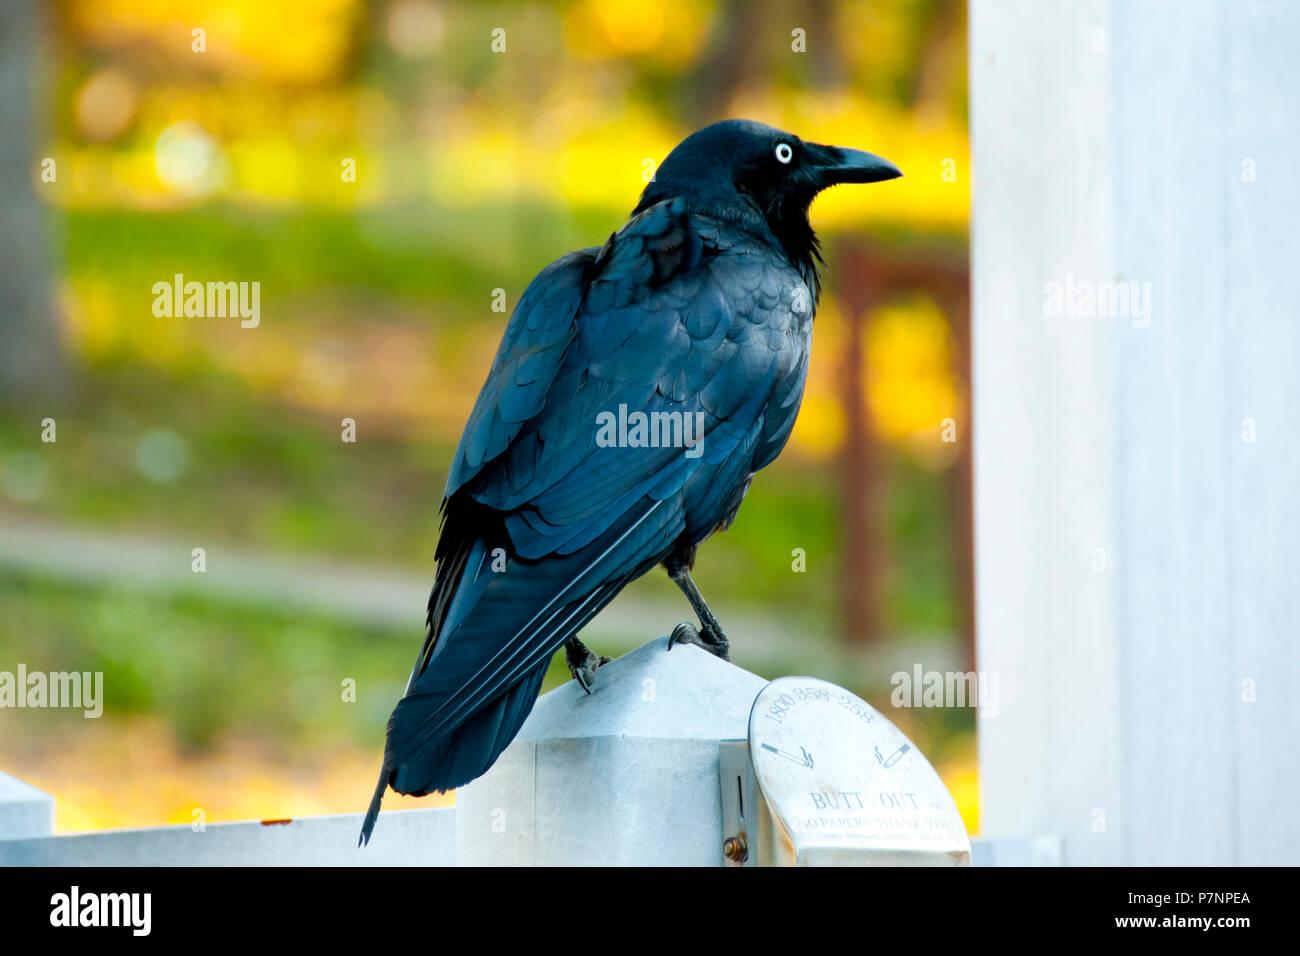 Australian Raven - Perth - Stock Image